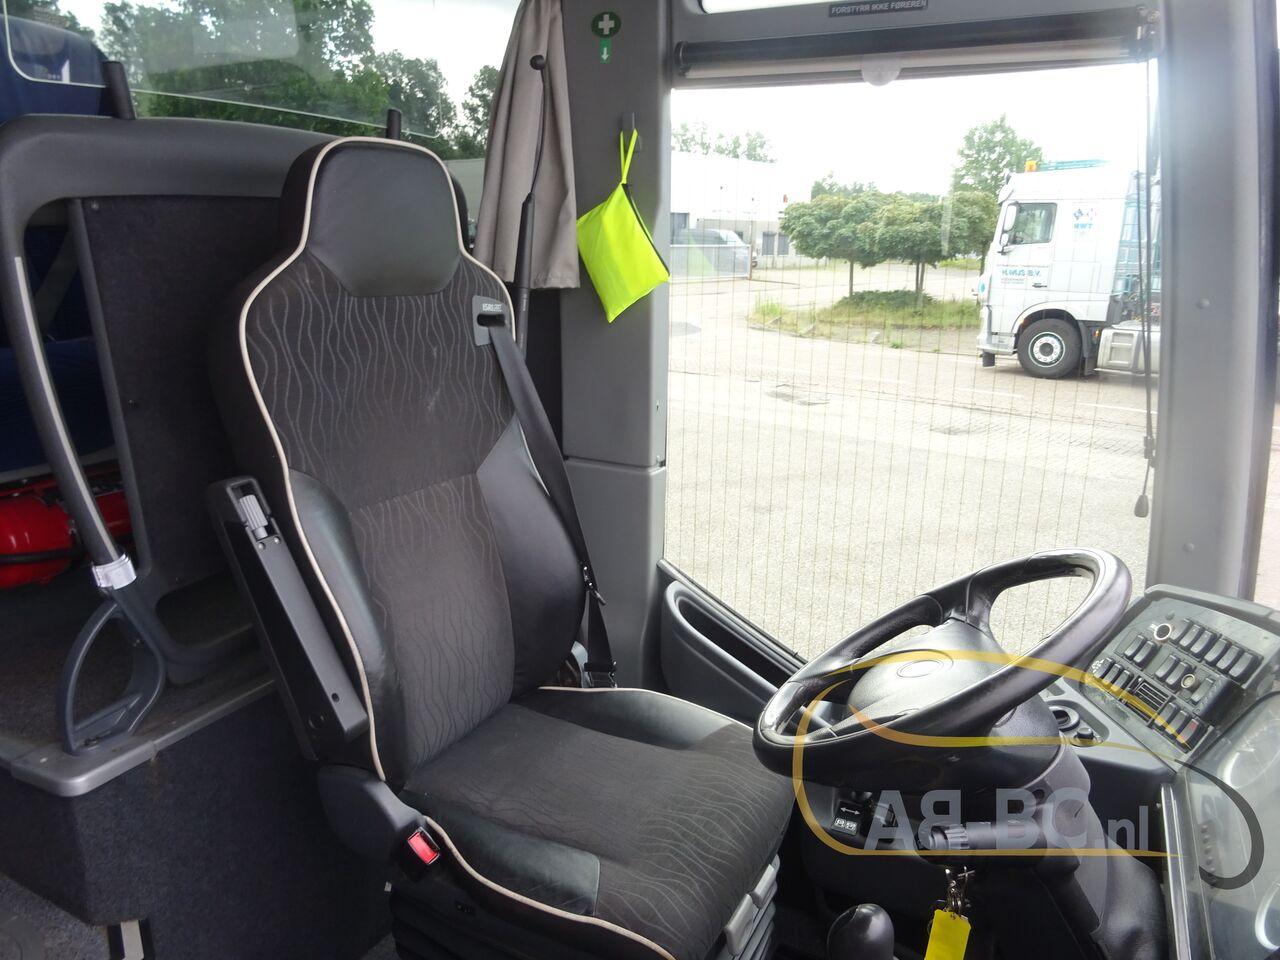 coach-busSETRA-S415-GT-HD-FINAL-EDITION---1627457155940232739_big_38940f2562376a754ef1e60afe3c4434--21050713010665719300